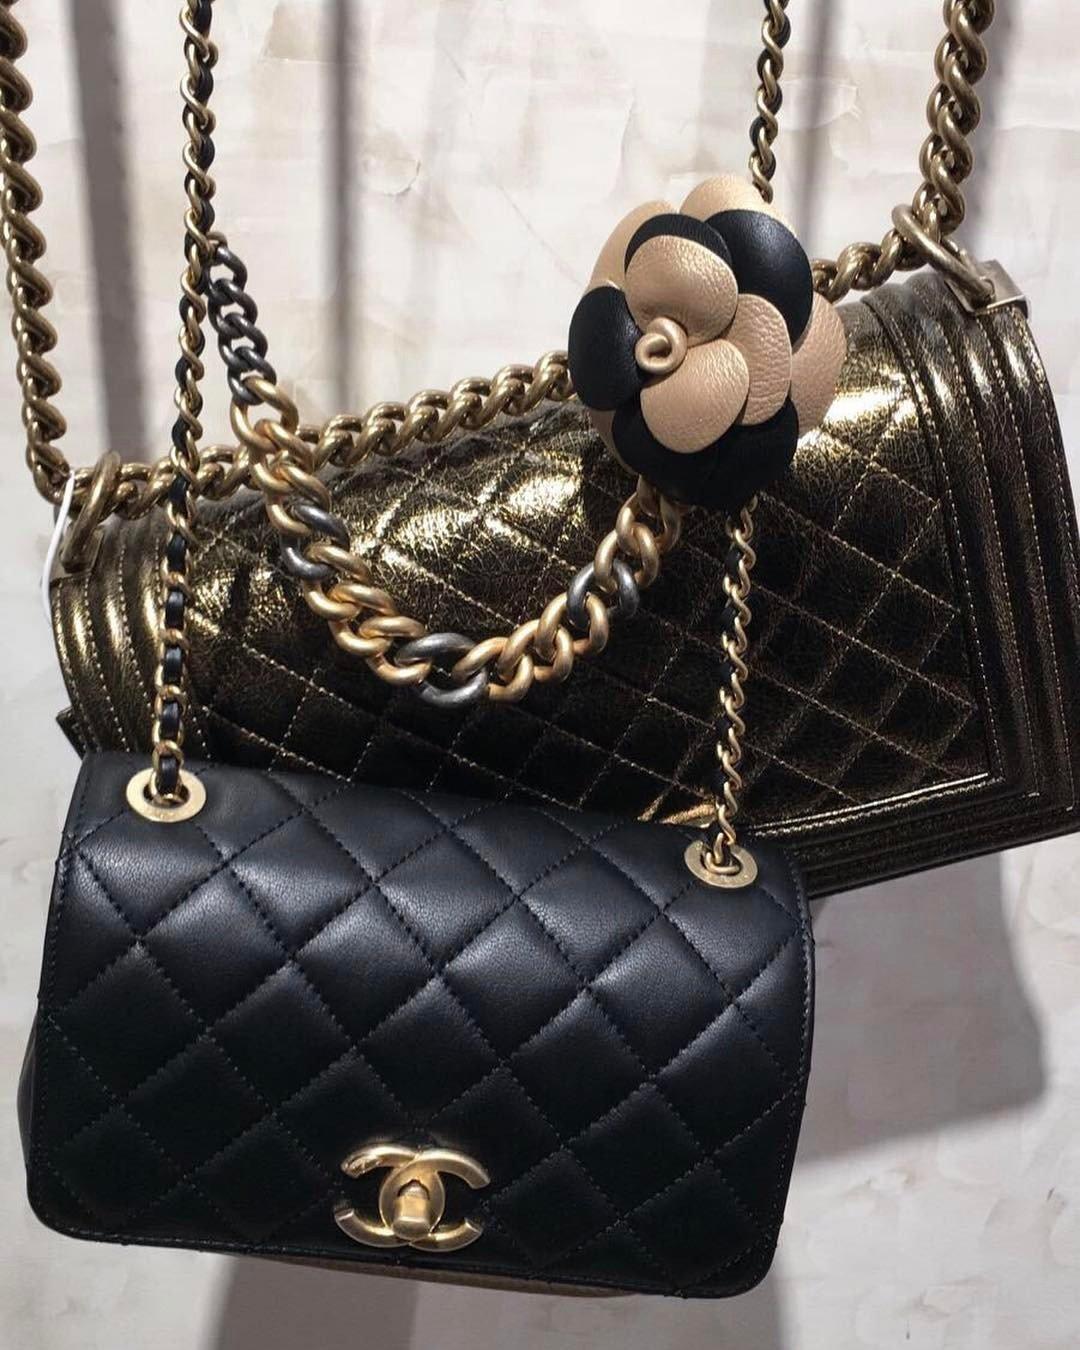 Chanel-Camellia-Flower-Bag-3